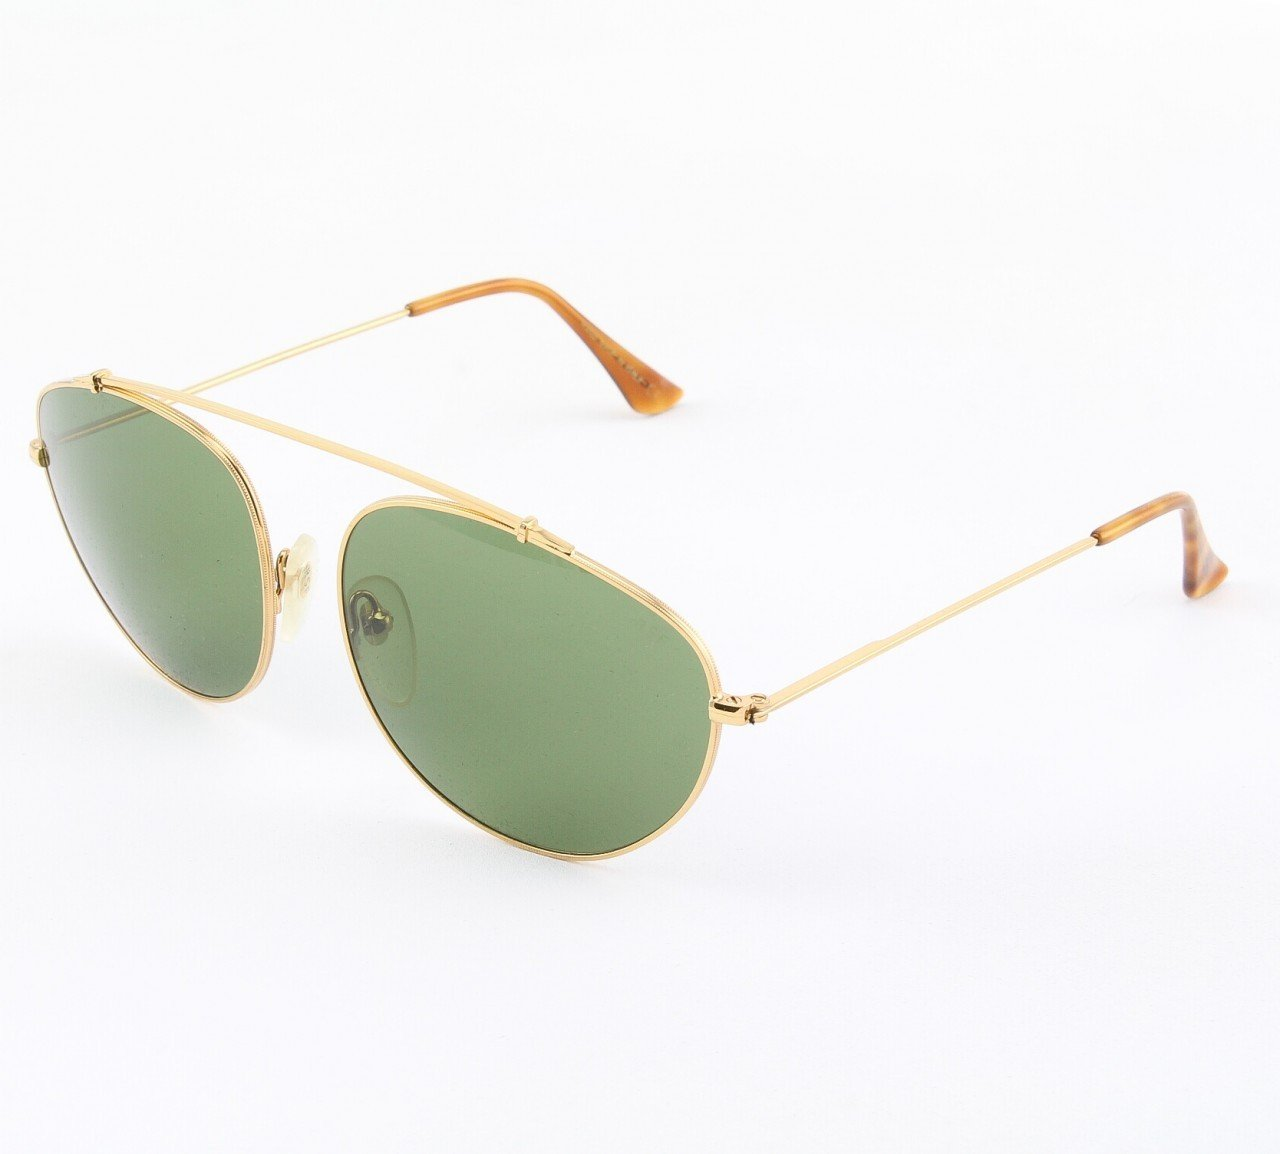 Super Leon 713/2M Sunglasses Havana with Green Zeiss Lenses by RETROSUPERFUTURE